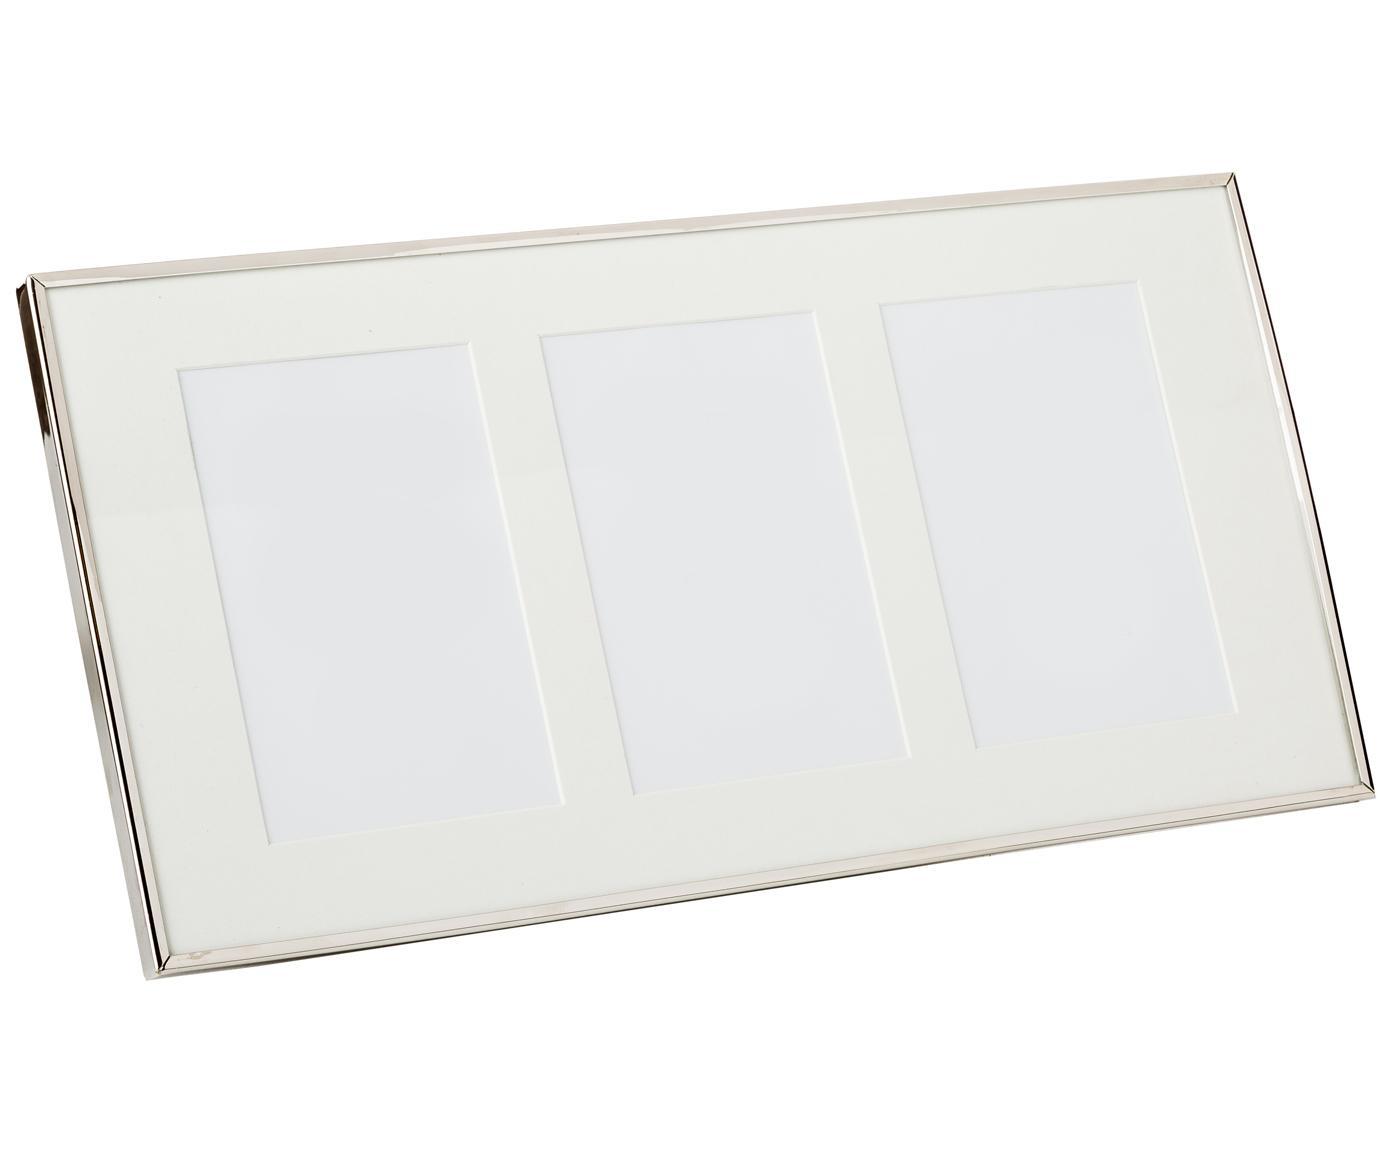 Cornice Eva, Cornice: metallo, Argento, Per 3 foto 10 x 15 cm